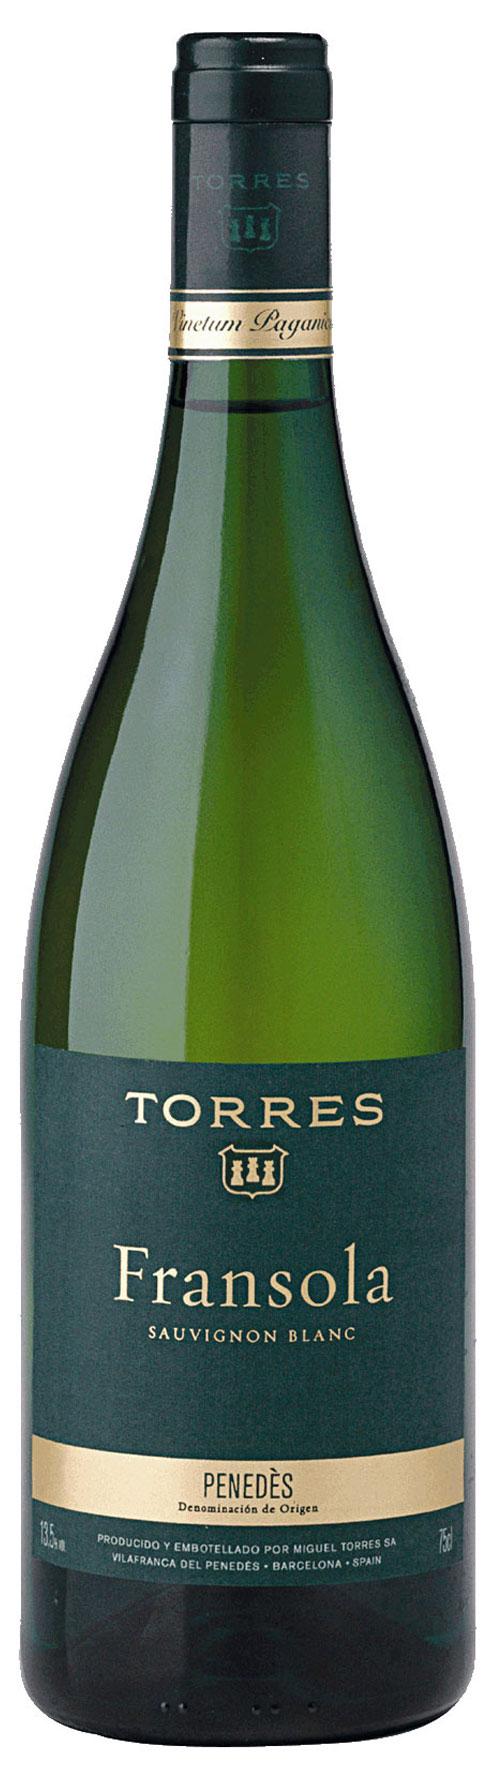 Torres Fransola Sauvignon Blanc 2019